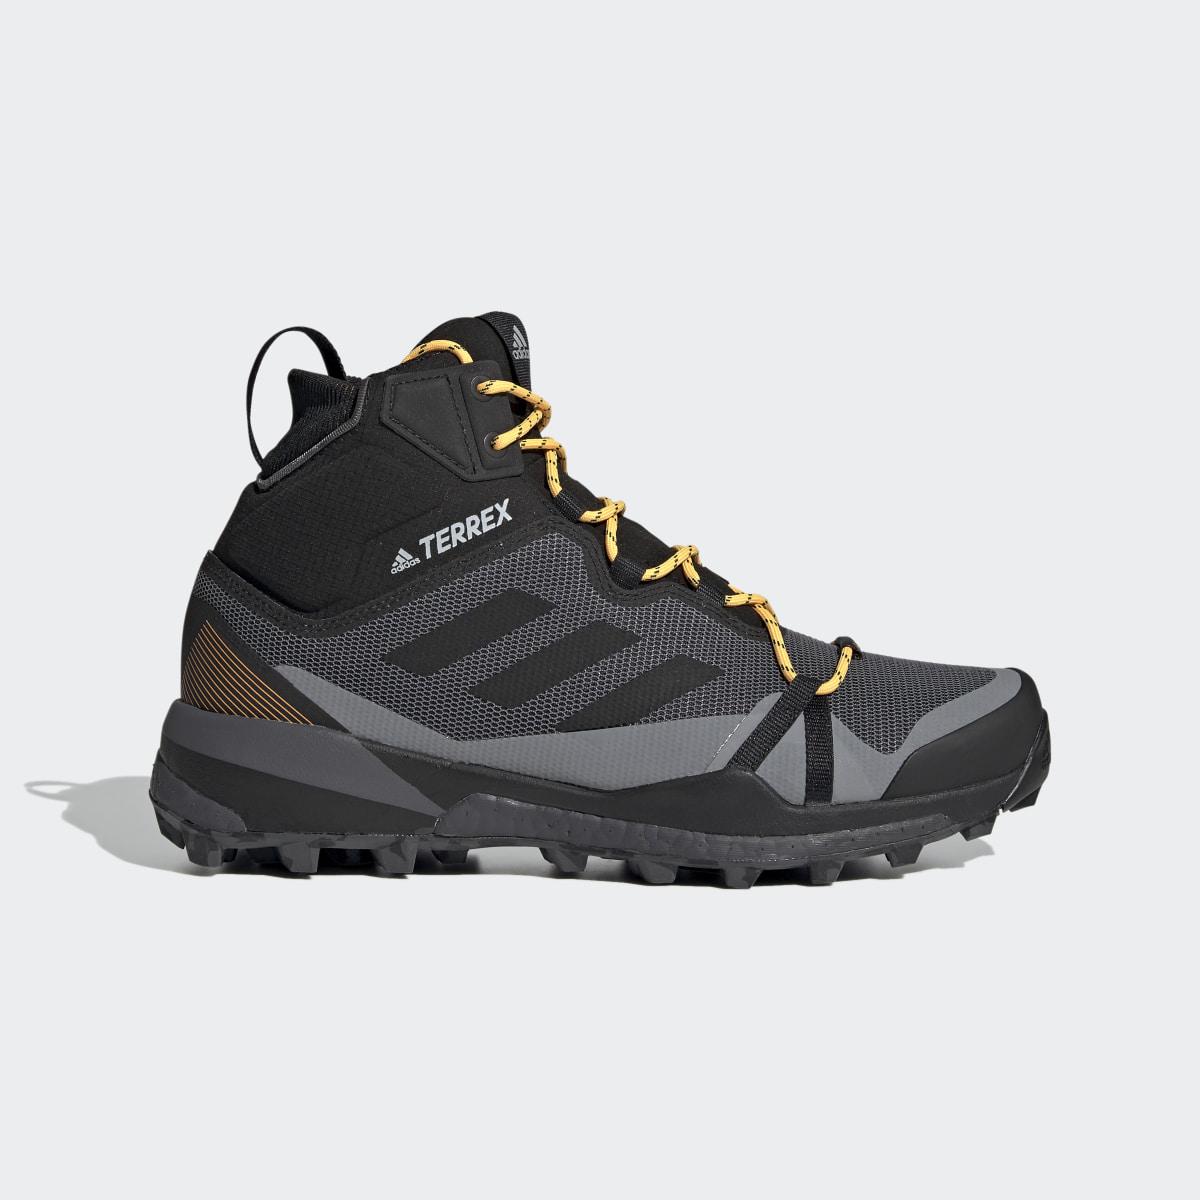 Zapatilla Terrex Skychaser LT Mid GORE-TEX Hiking